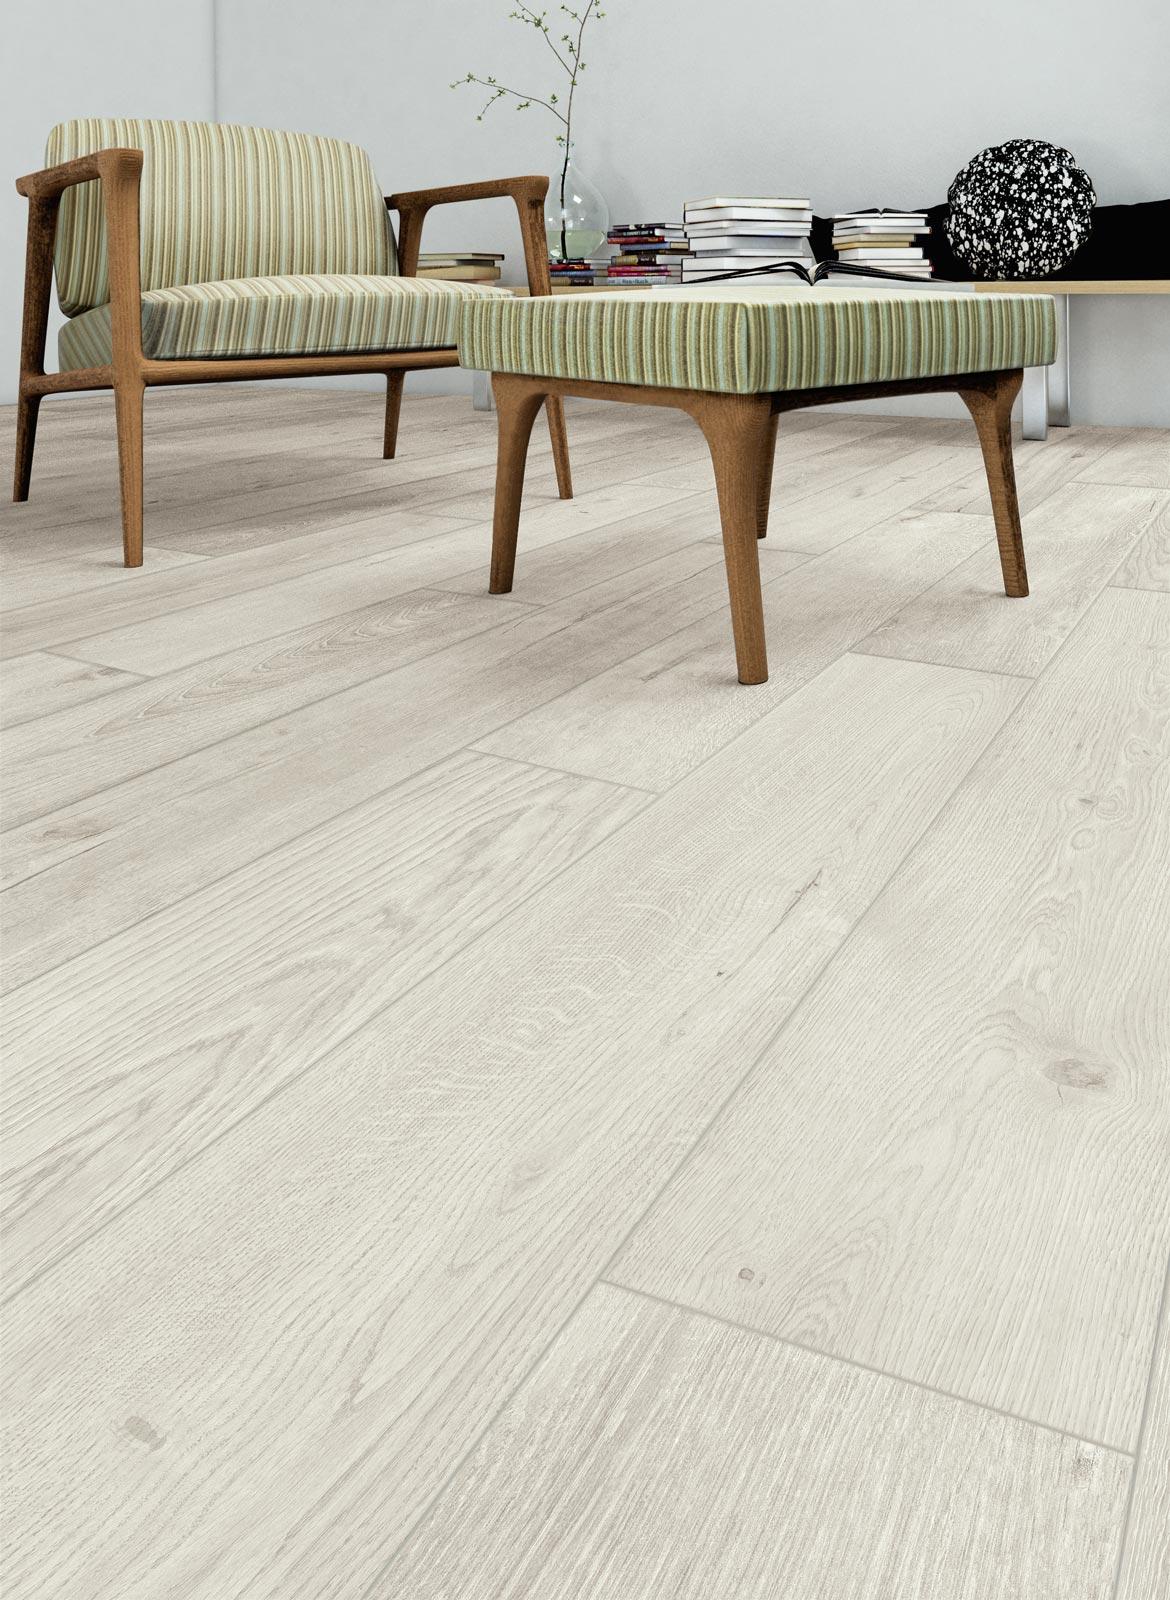 Woodspirit wood look stoneware ragno woodspirit ceramic tiles ragno6555 doublecrazyfo Images